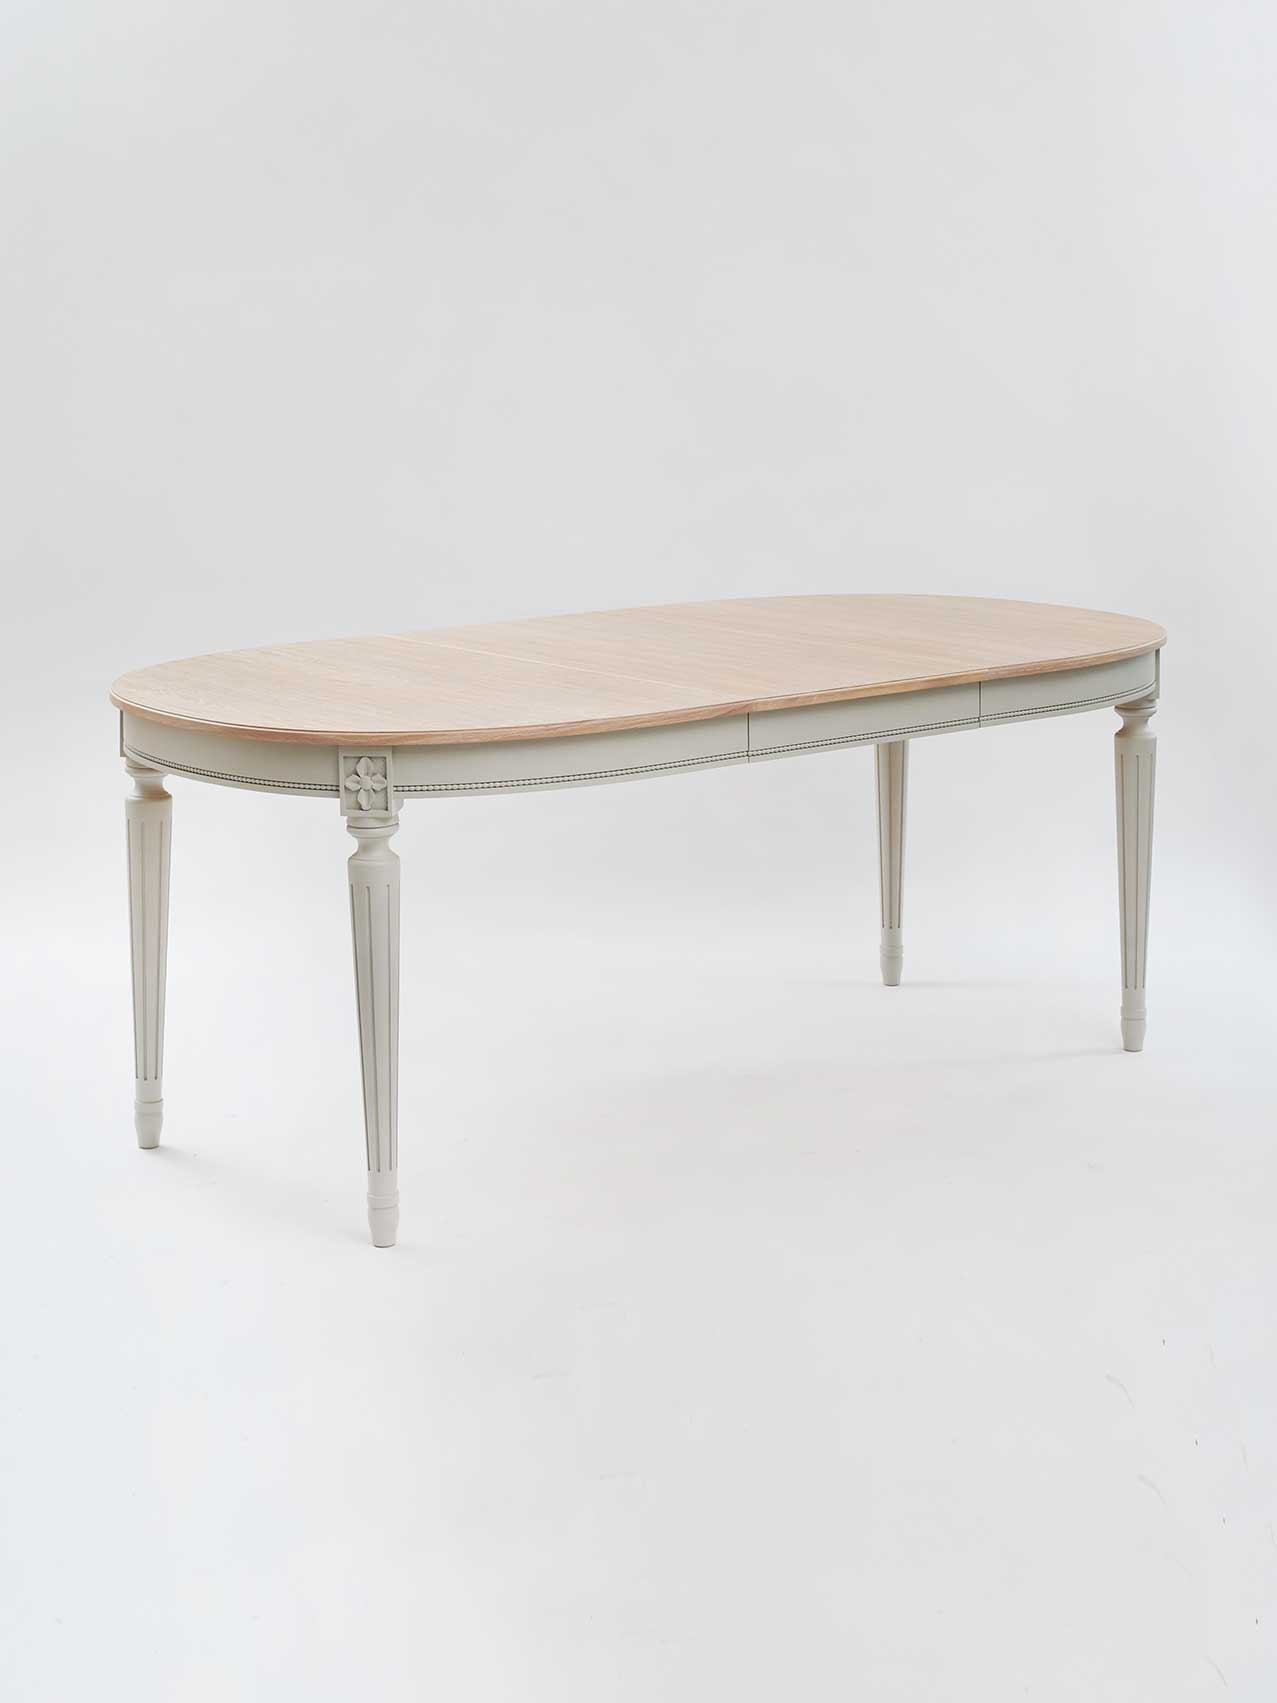 Gustavian Dining Table G403 Leporello